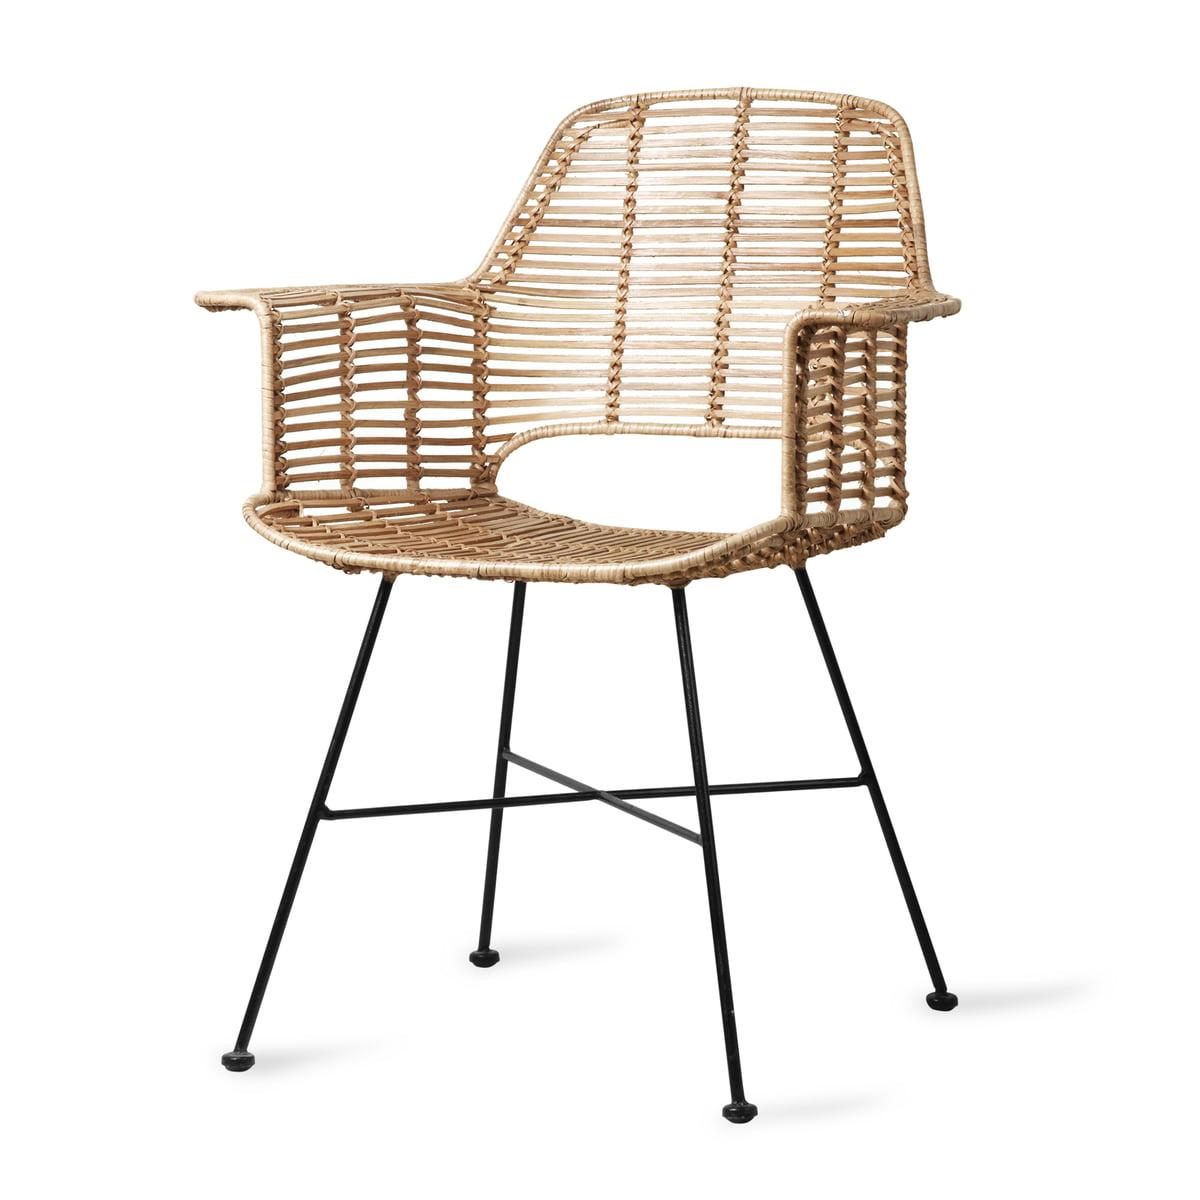 HKliving Rattan Tub Chair, natur